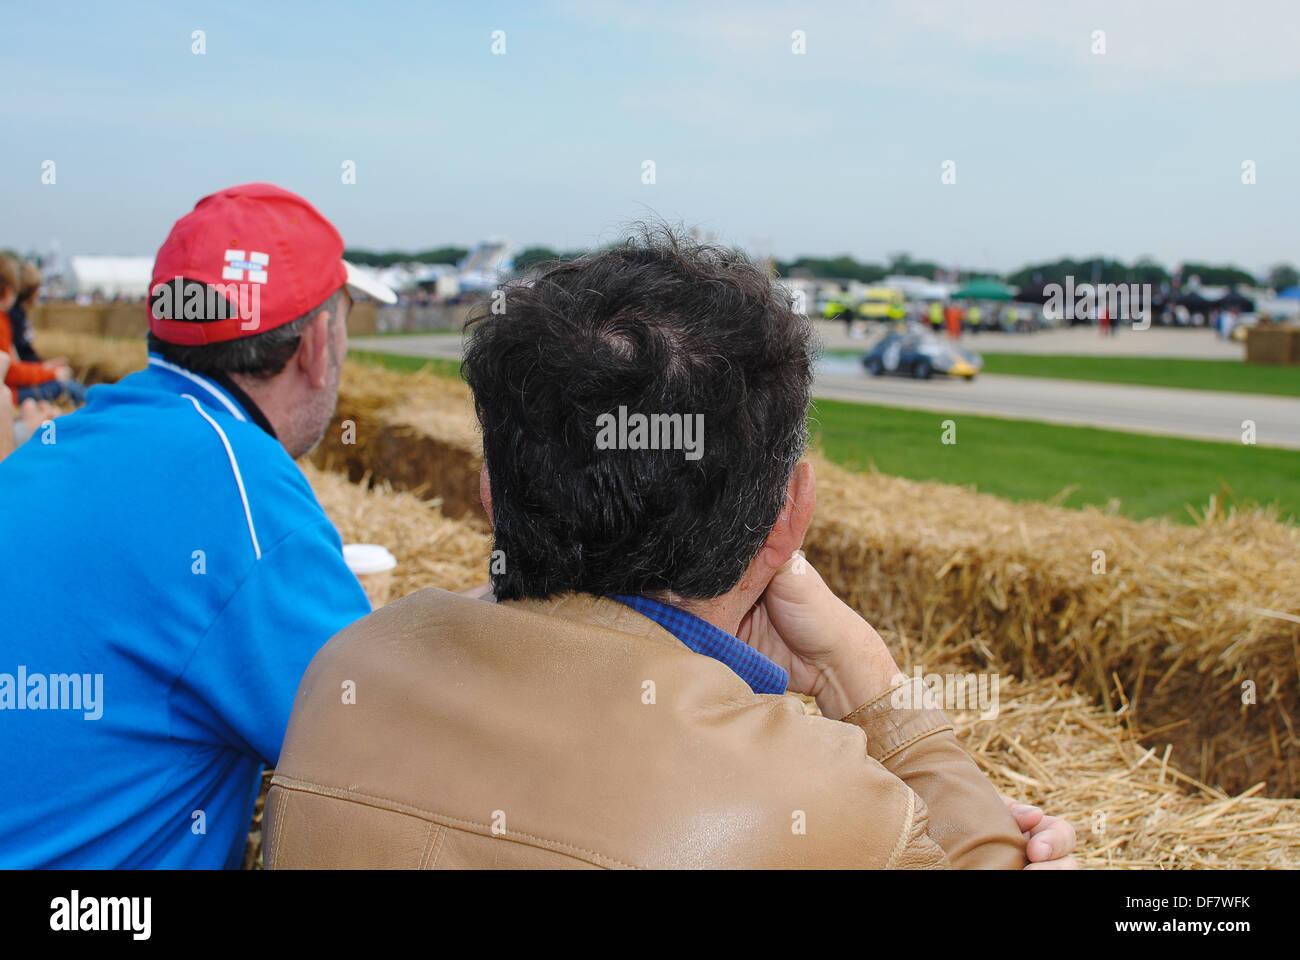 Male spectators watching motor sport - Stock Image